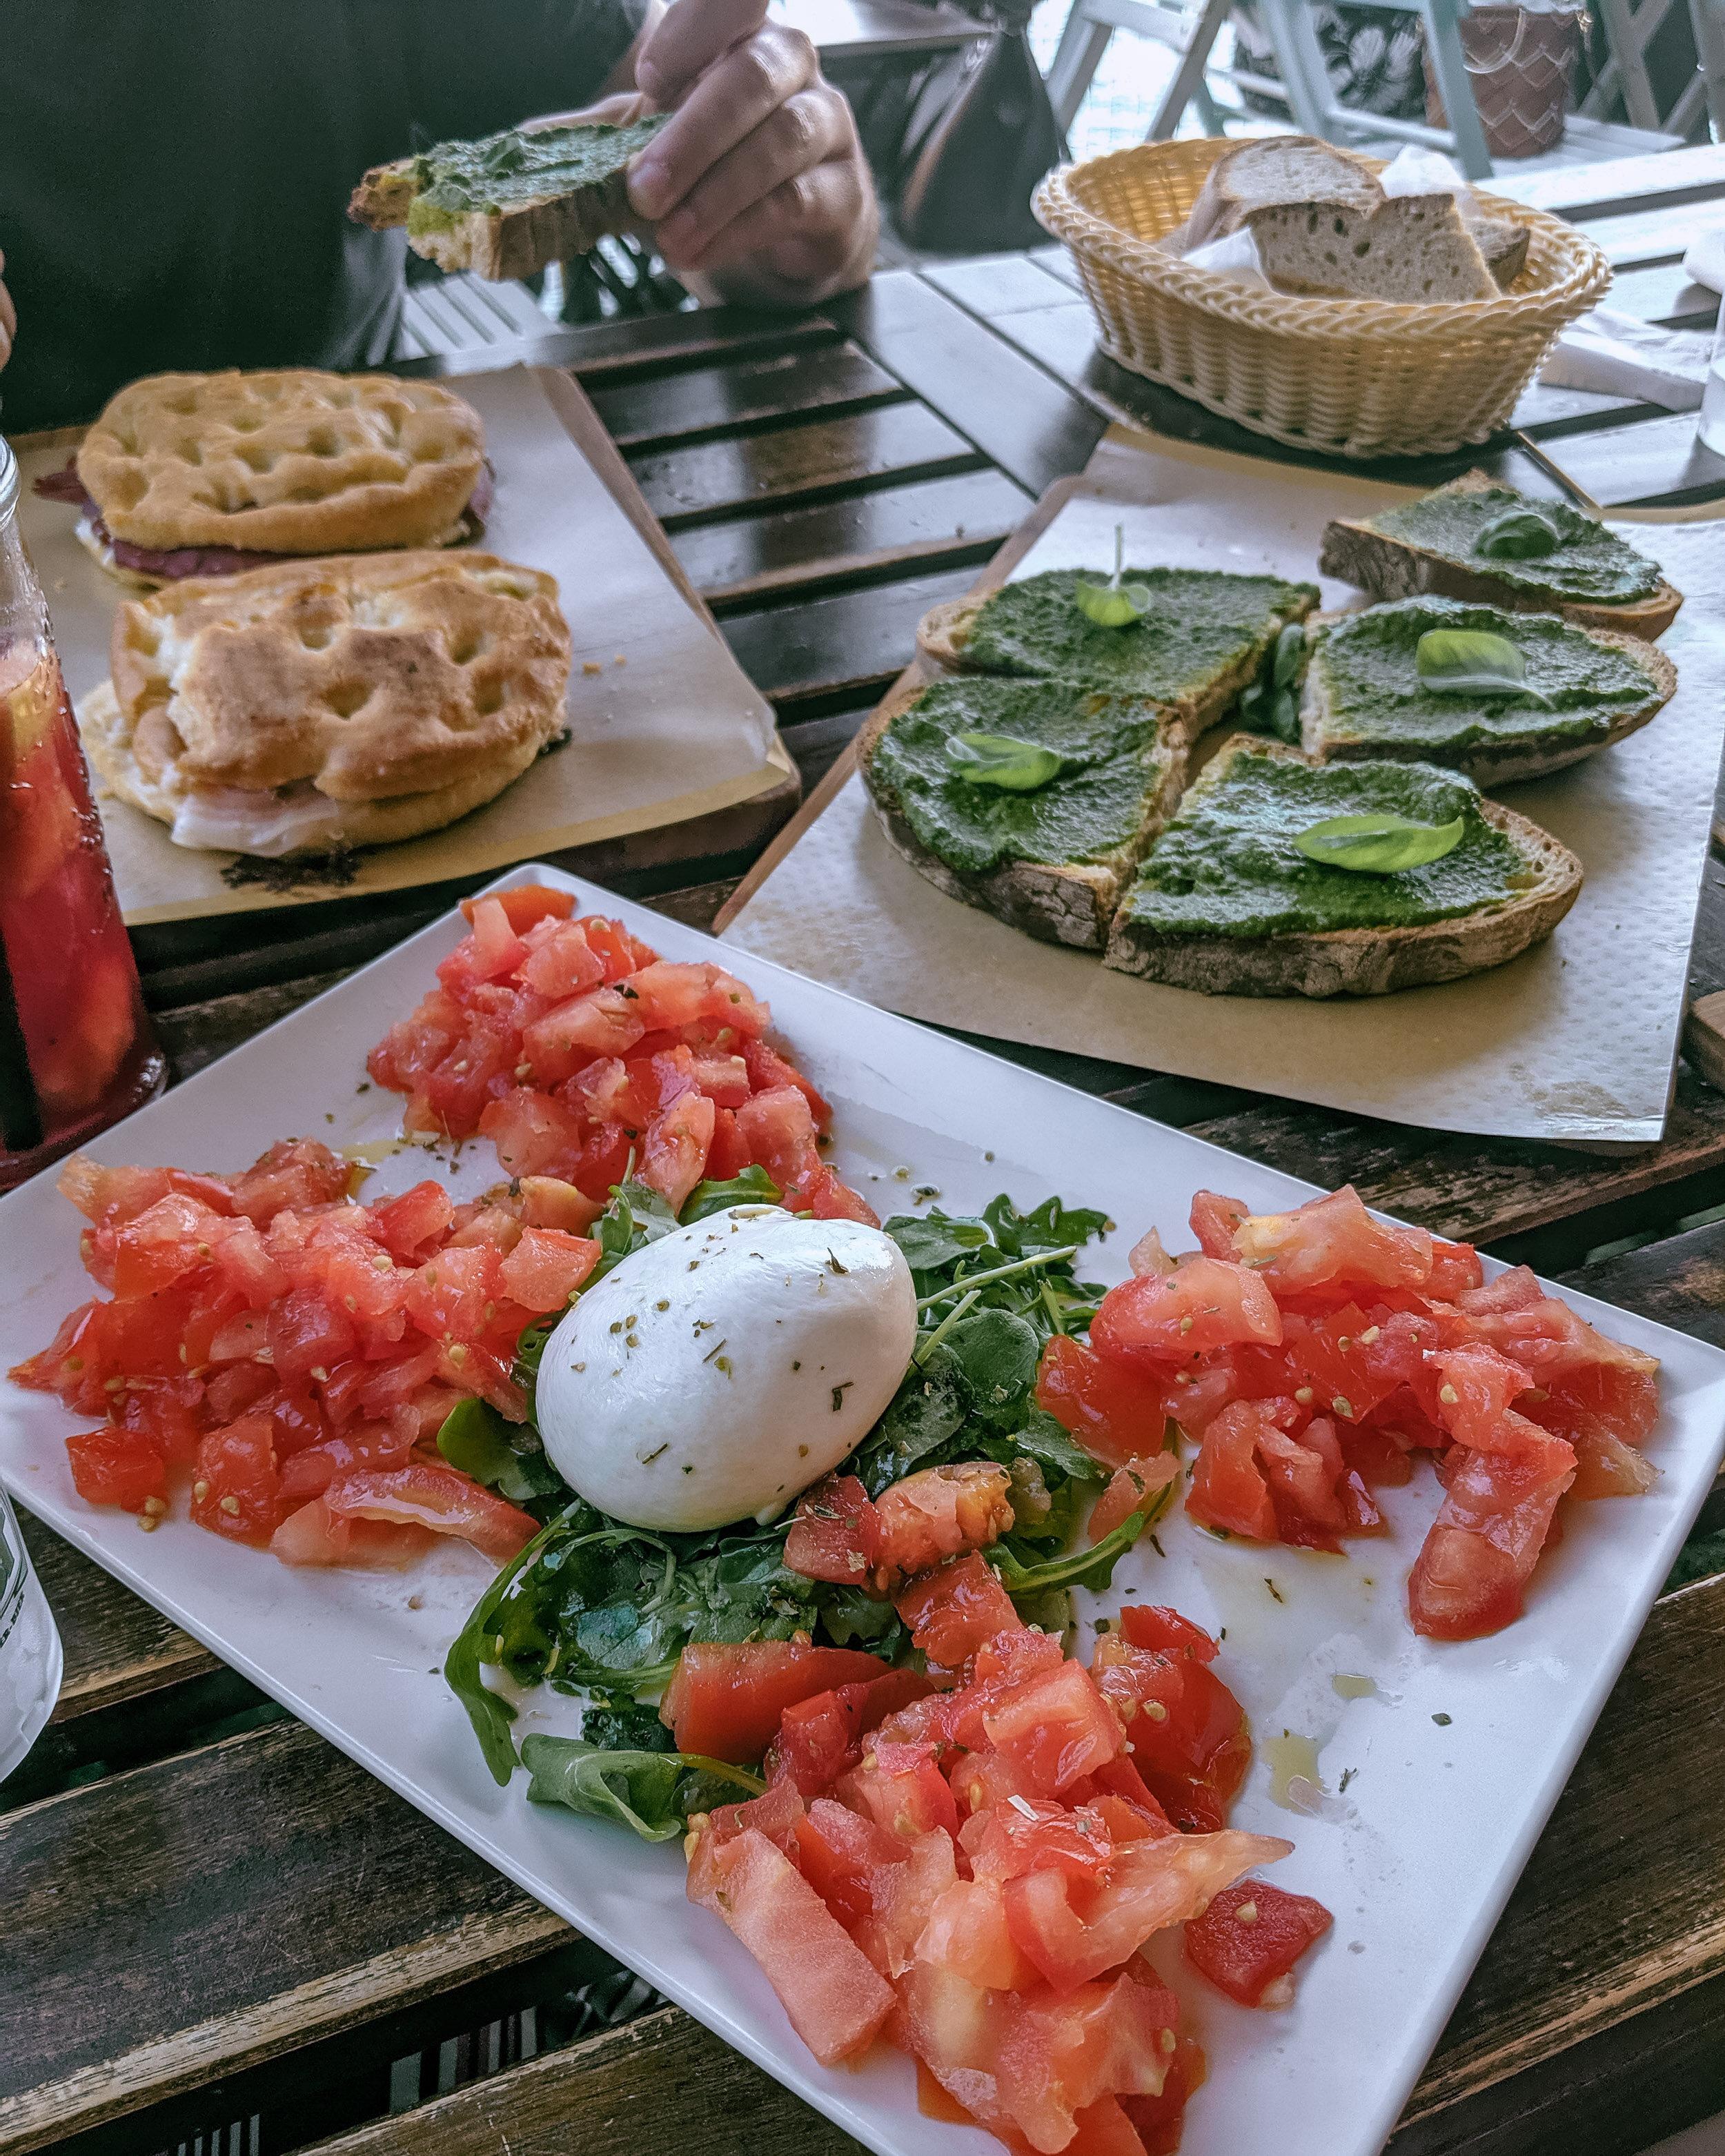 Rachel Off Duty: Tomatoes, Arugula and Burrata Cheese